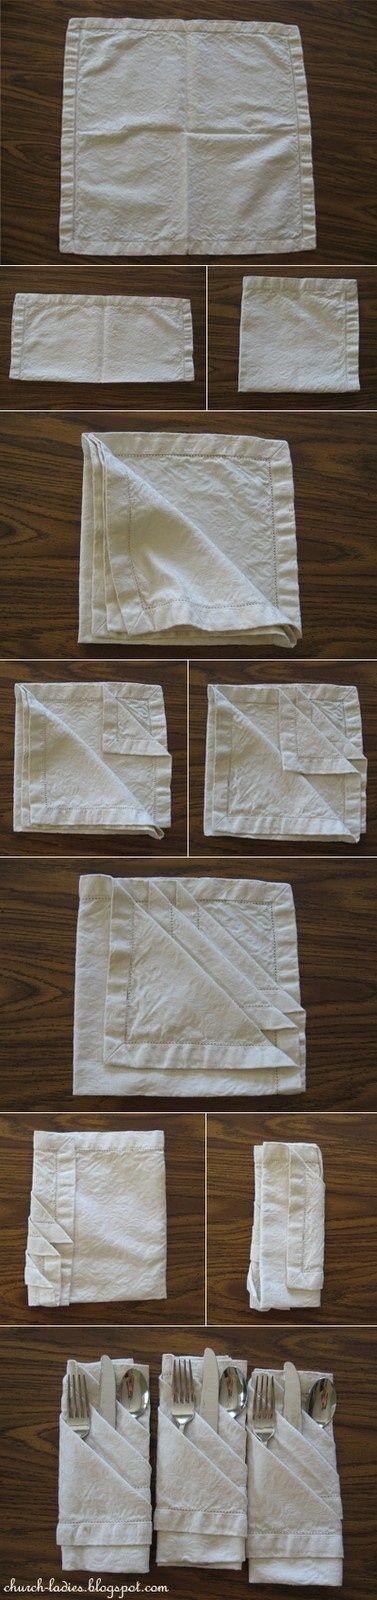 Top 10 great diy napkin folding tutorials for 10 easy table napkin folding